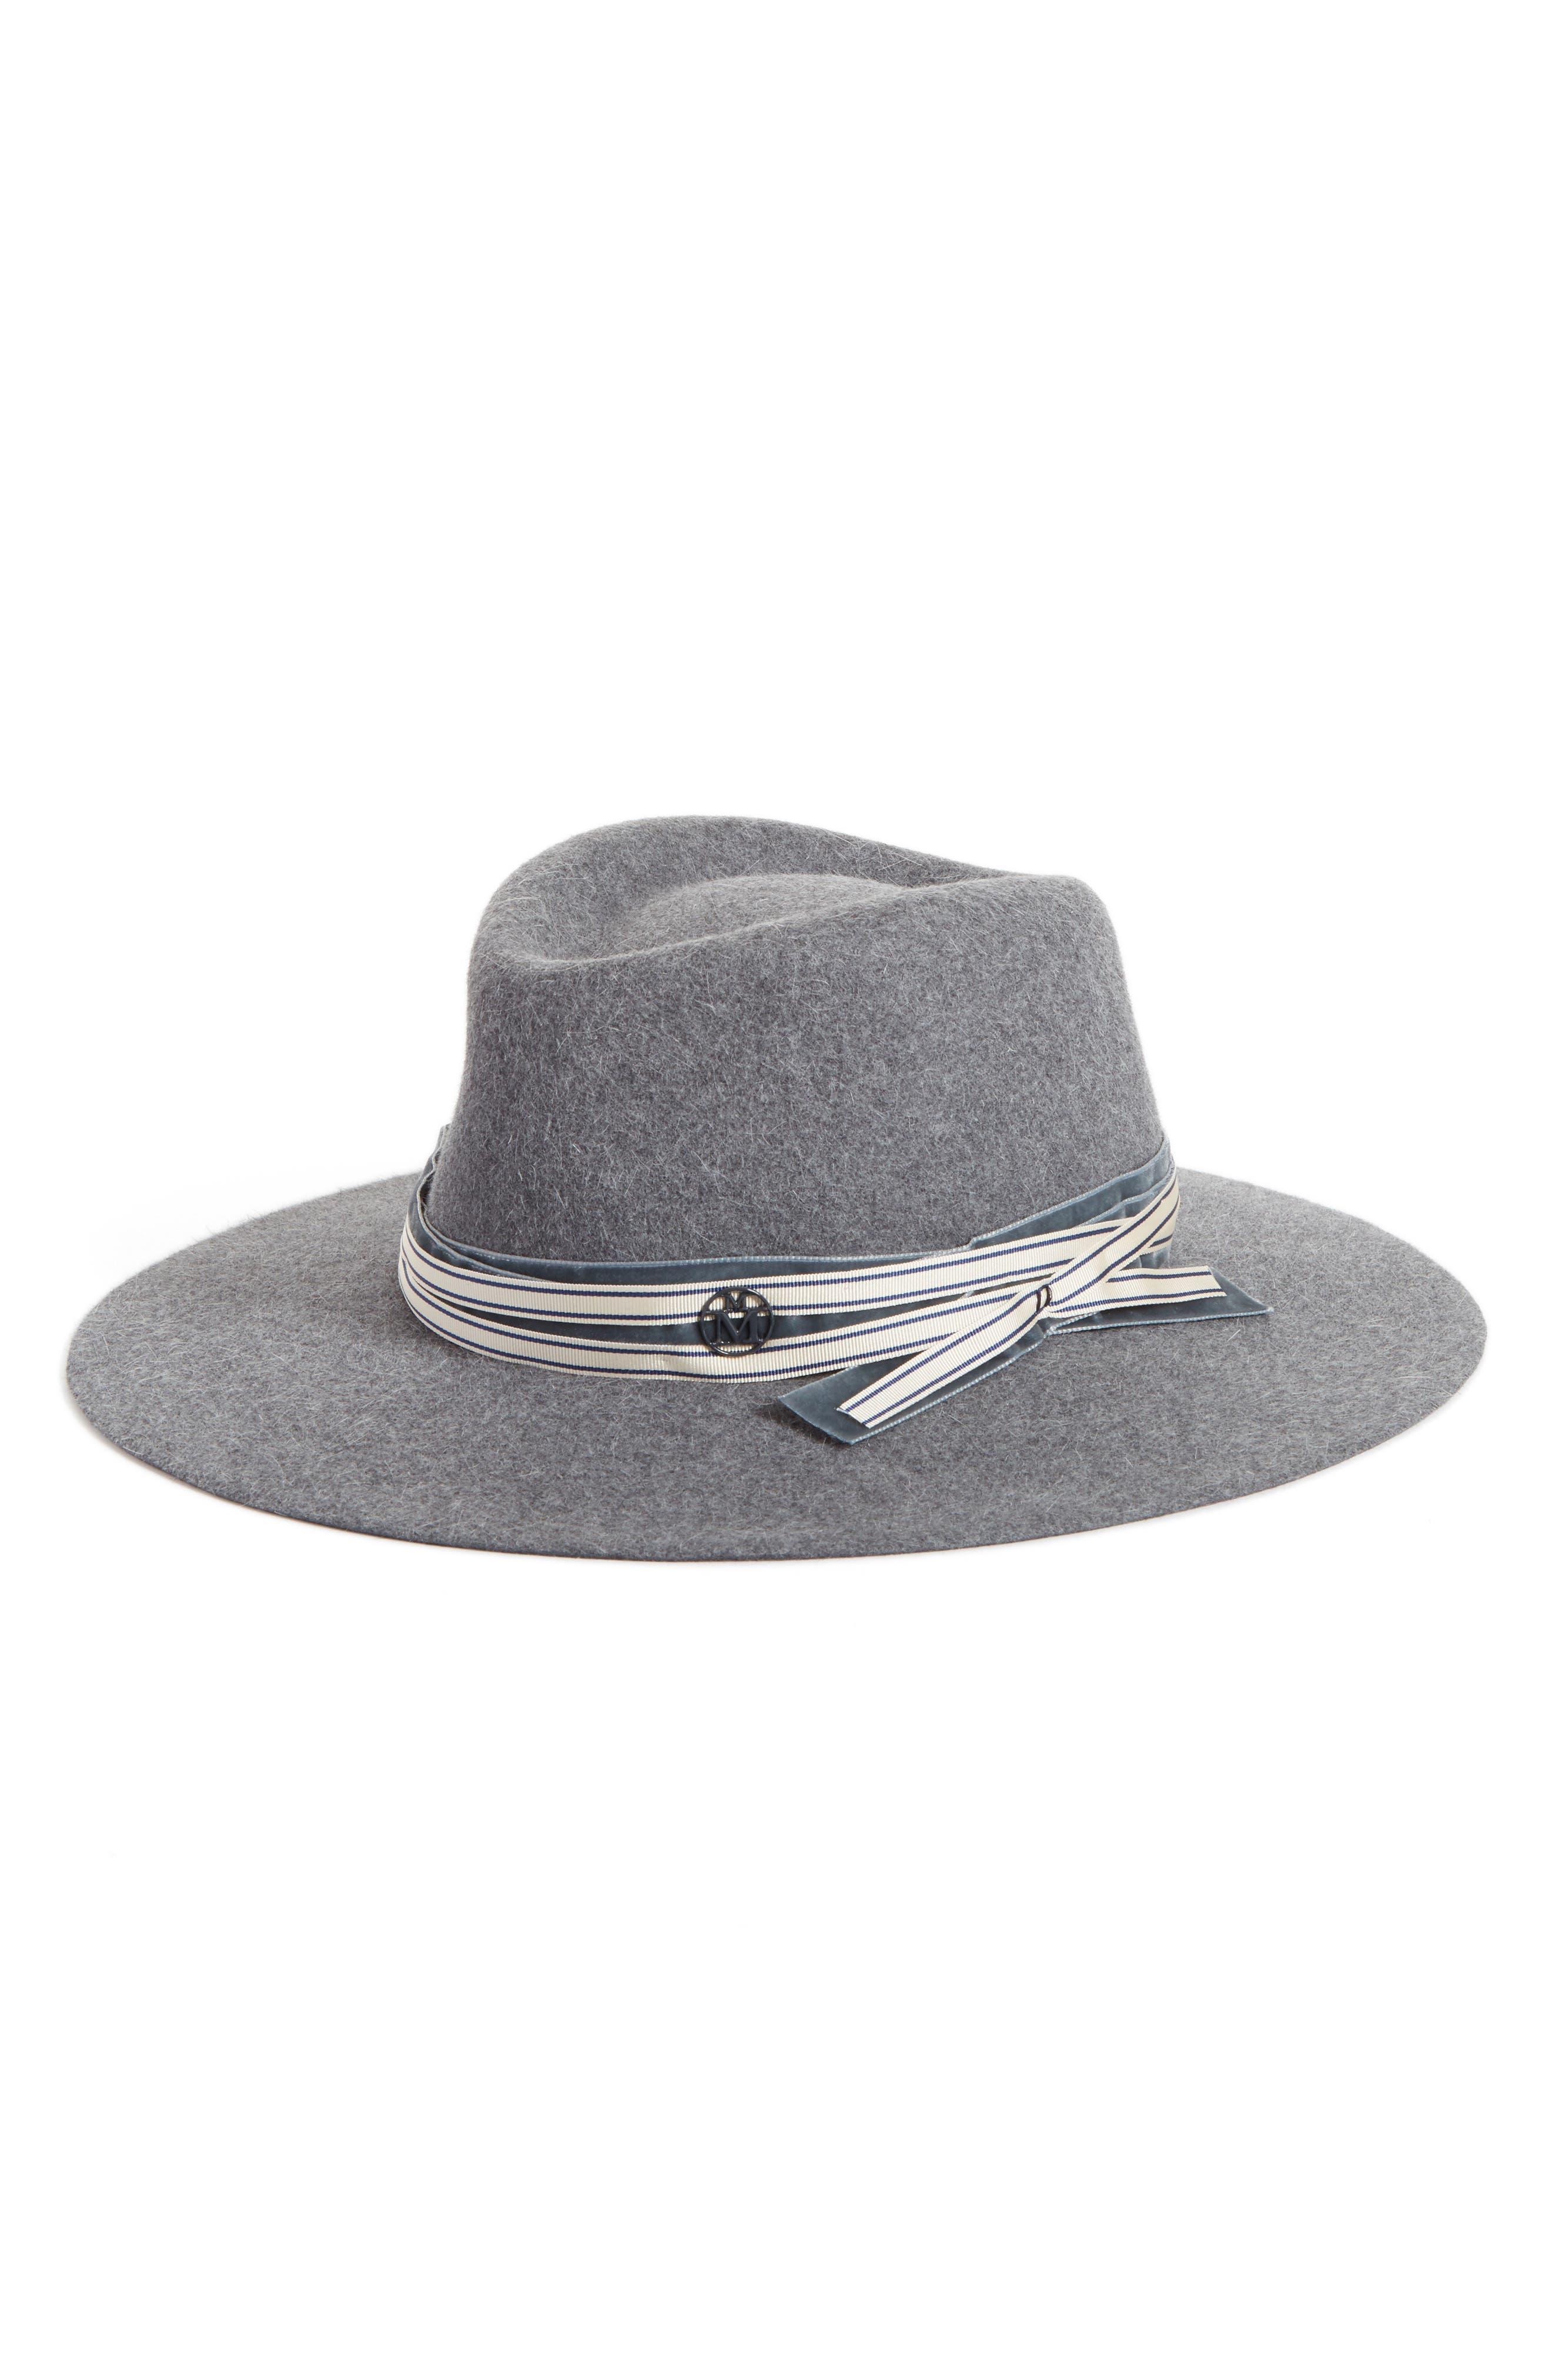 Maison Michel Charles Fur Felt Hat